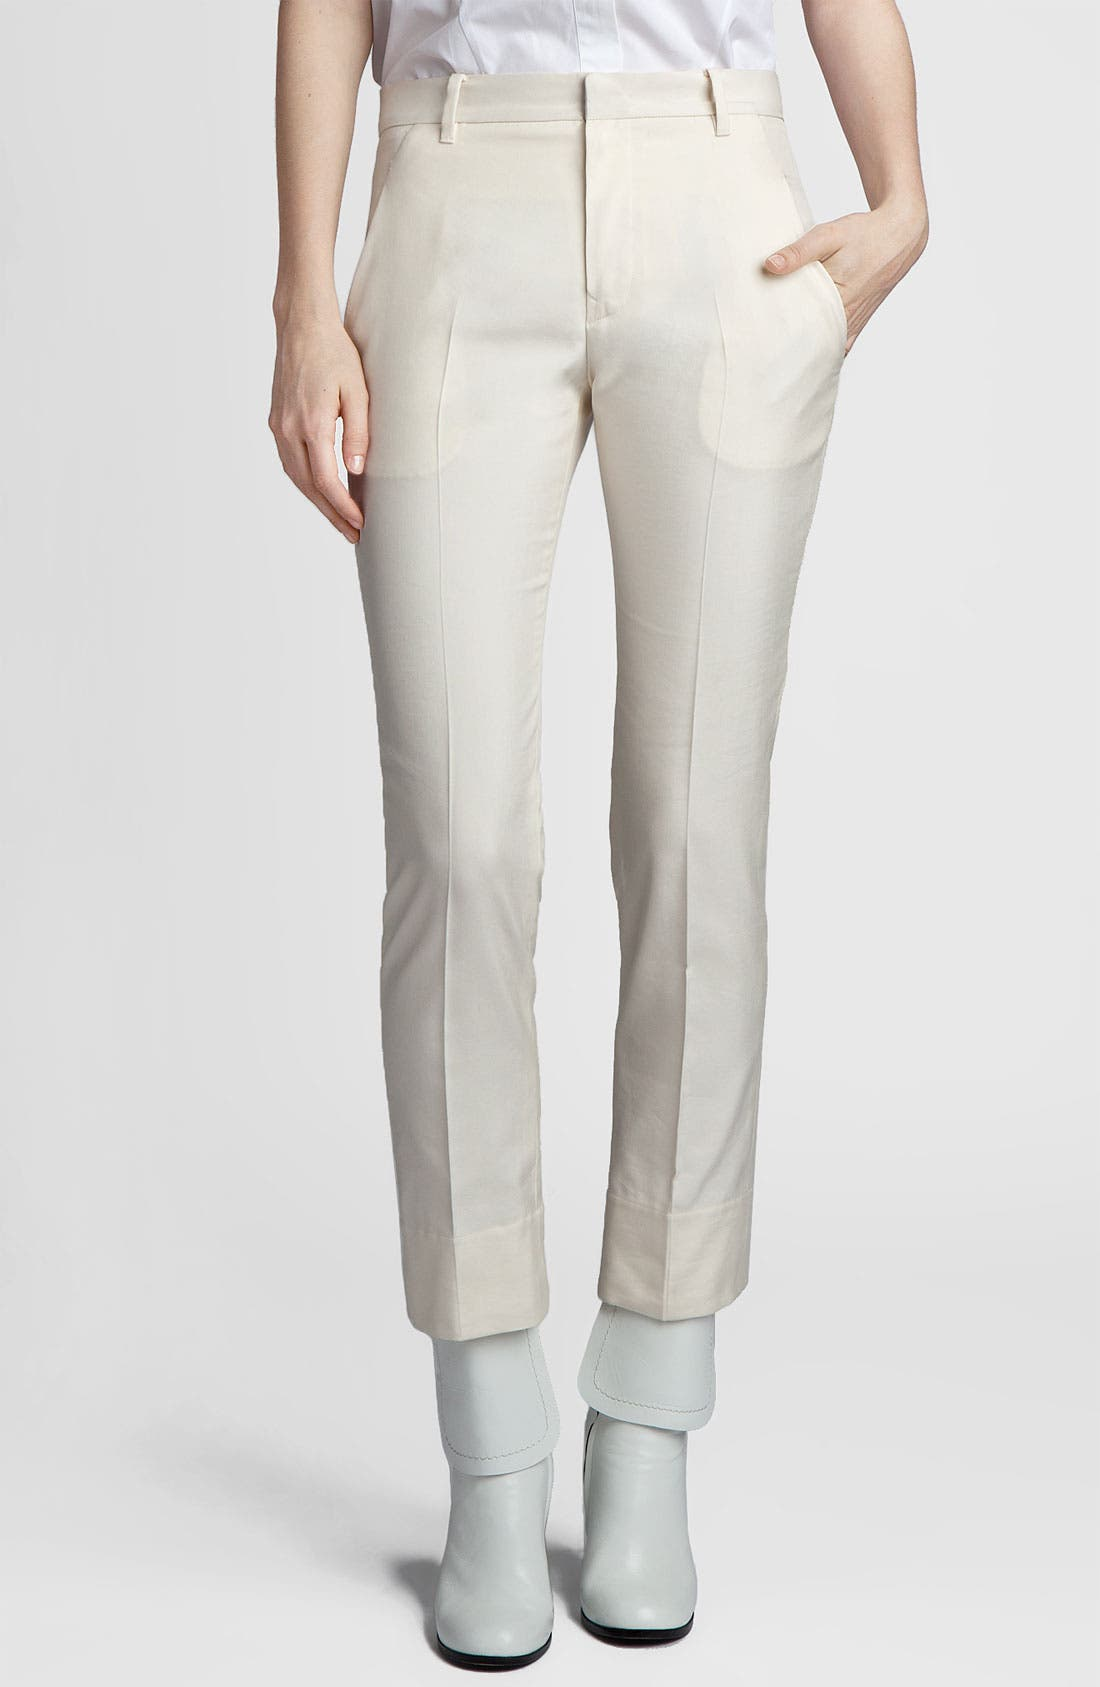 Alternate Image 1 Selected - Jil Sander 'Niccolo' Slim Cotton & Silk Pants